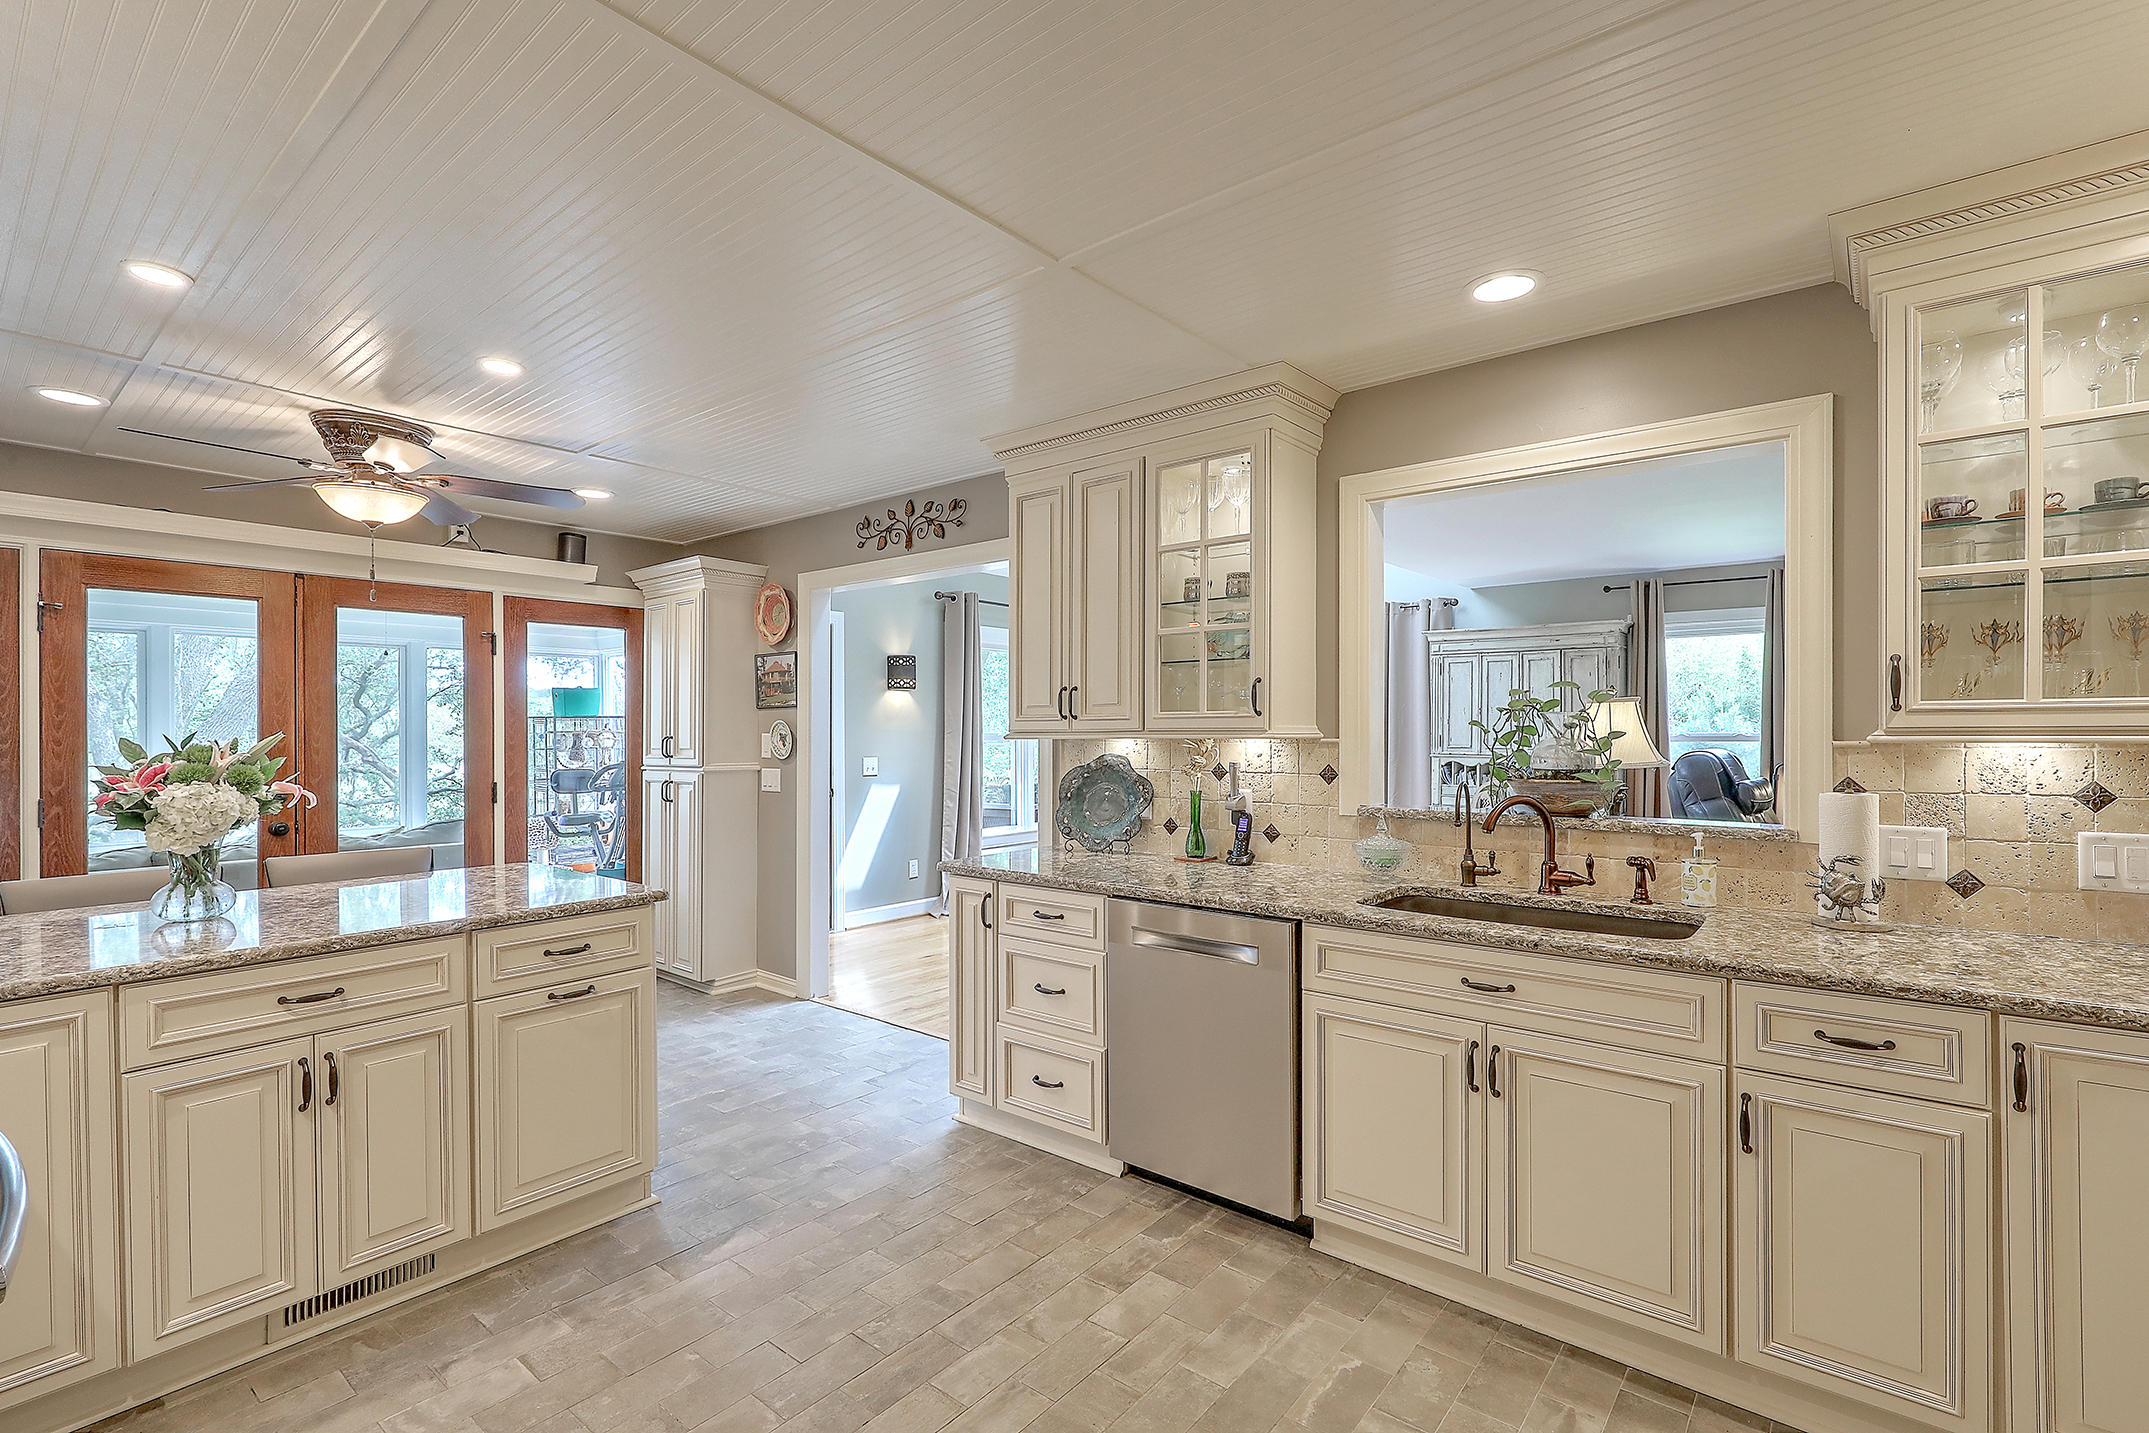 Stono Pointe Homes For Sale - 2660 Burden Creek, Johns Island, SC - 38